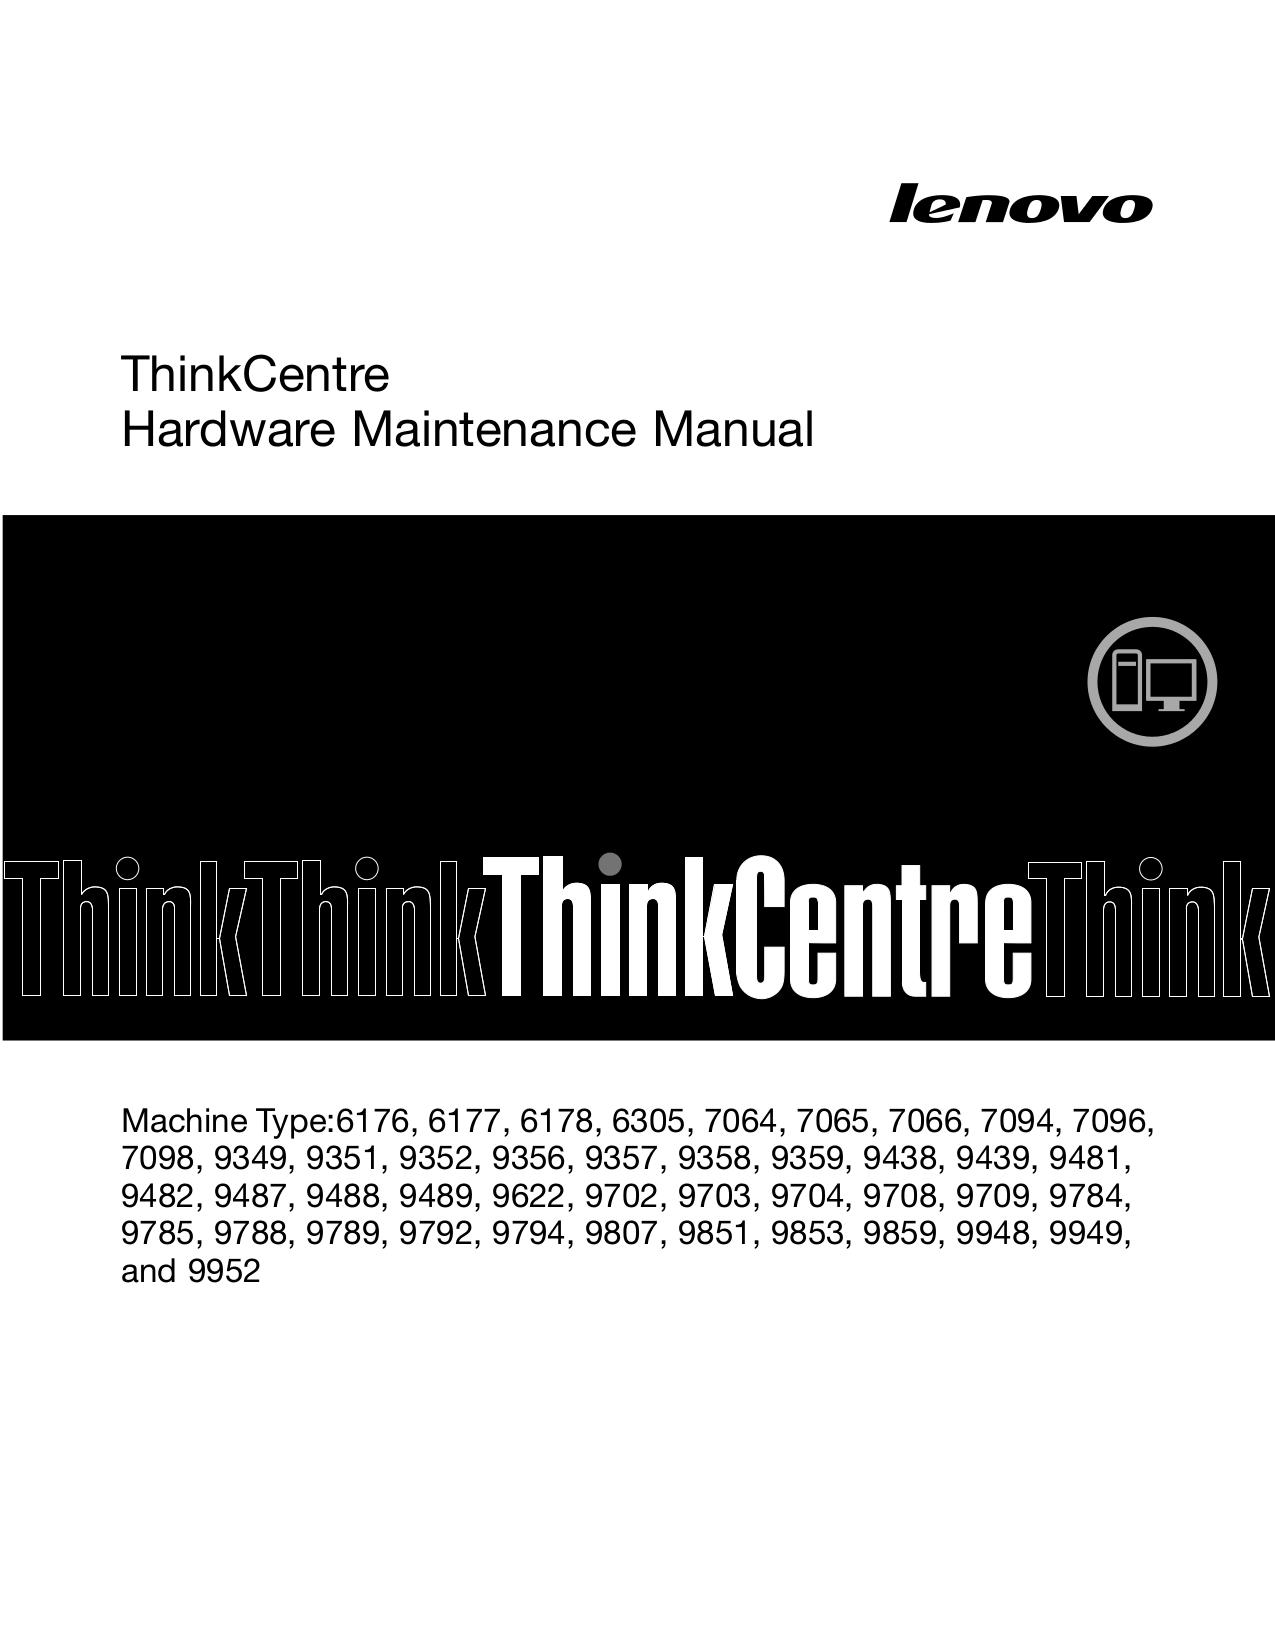 pdf for Lenovo Desktop ThinkCentre M57e 9349 manual